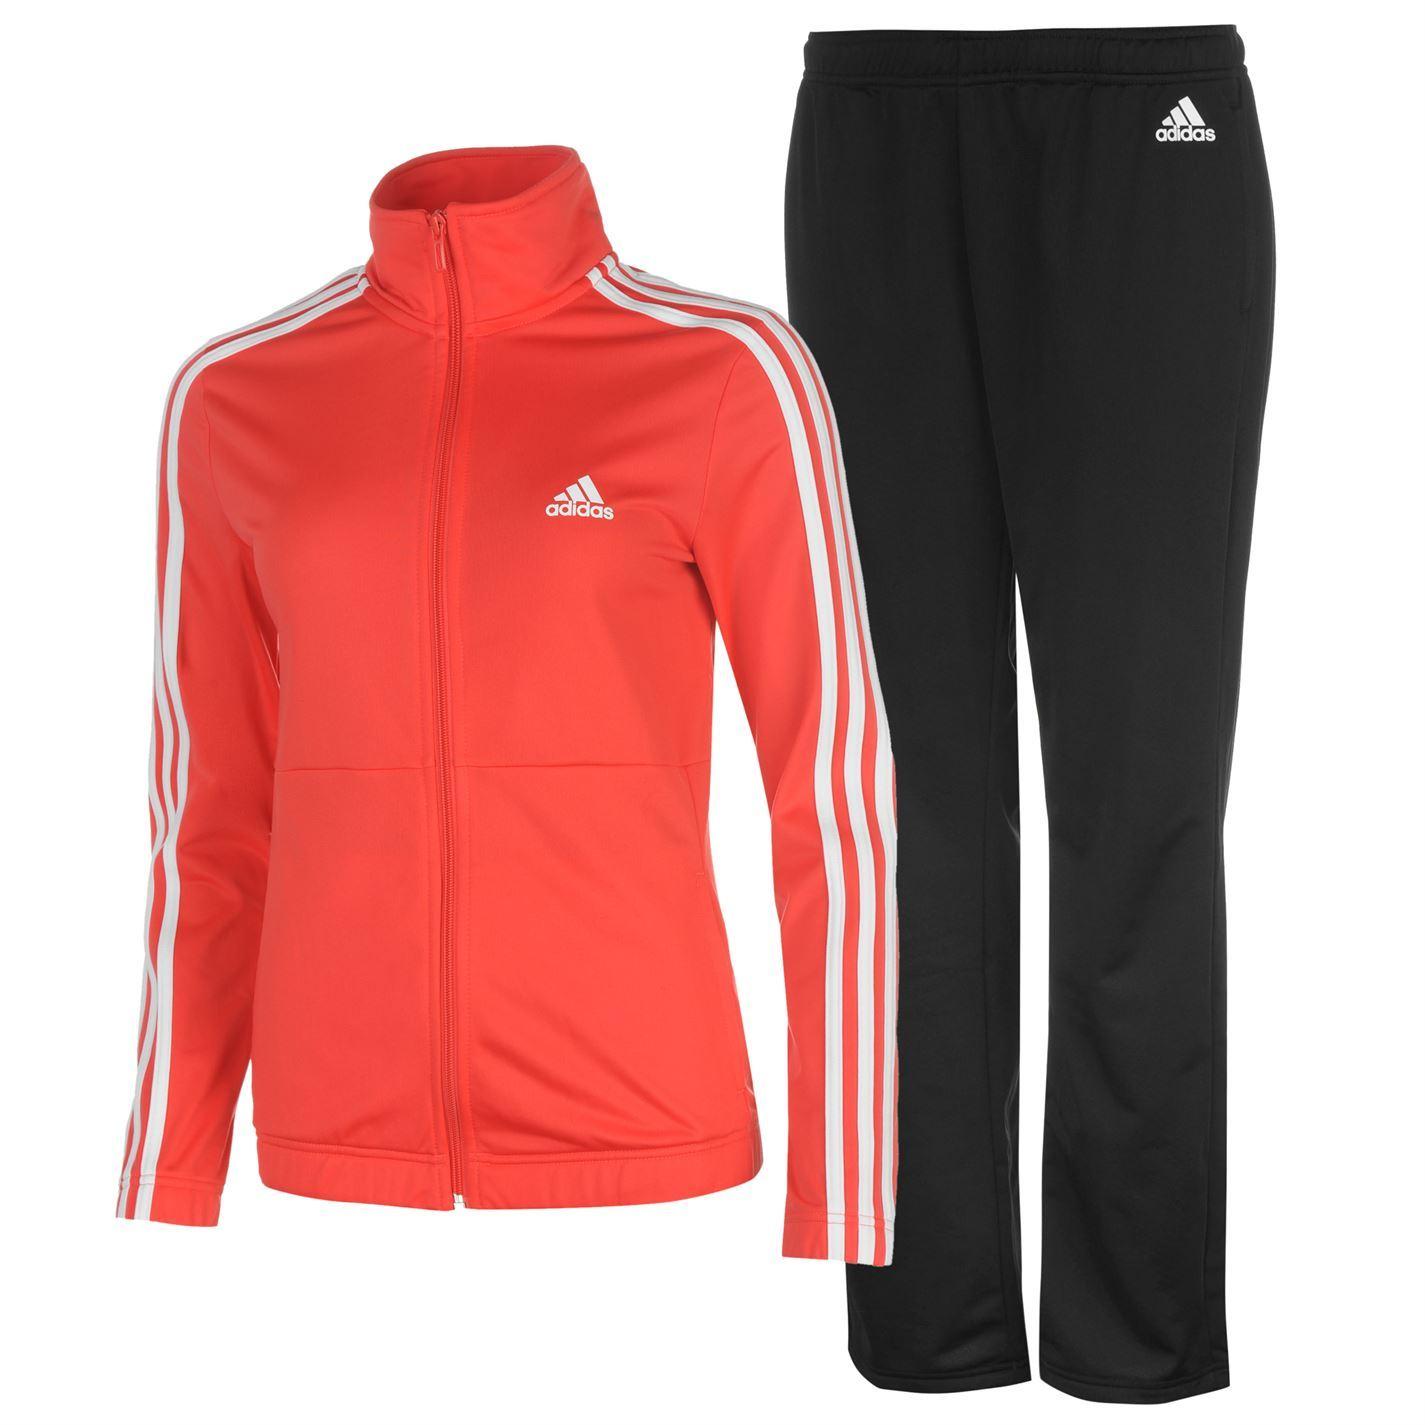 Adidas Womens Back 2 Basics 3 Stripes Tracksuit Sports